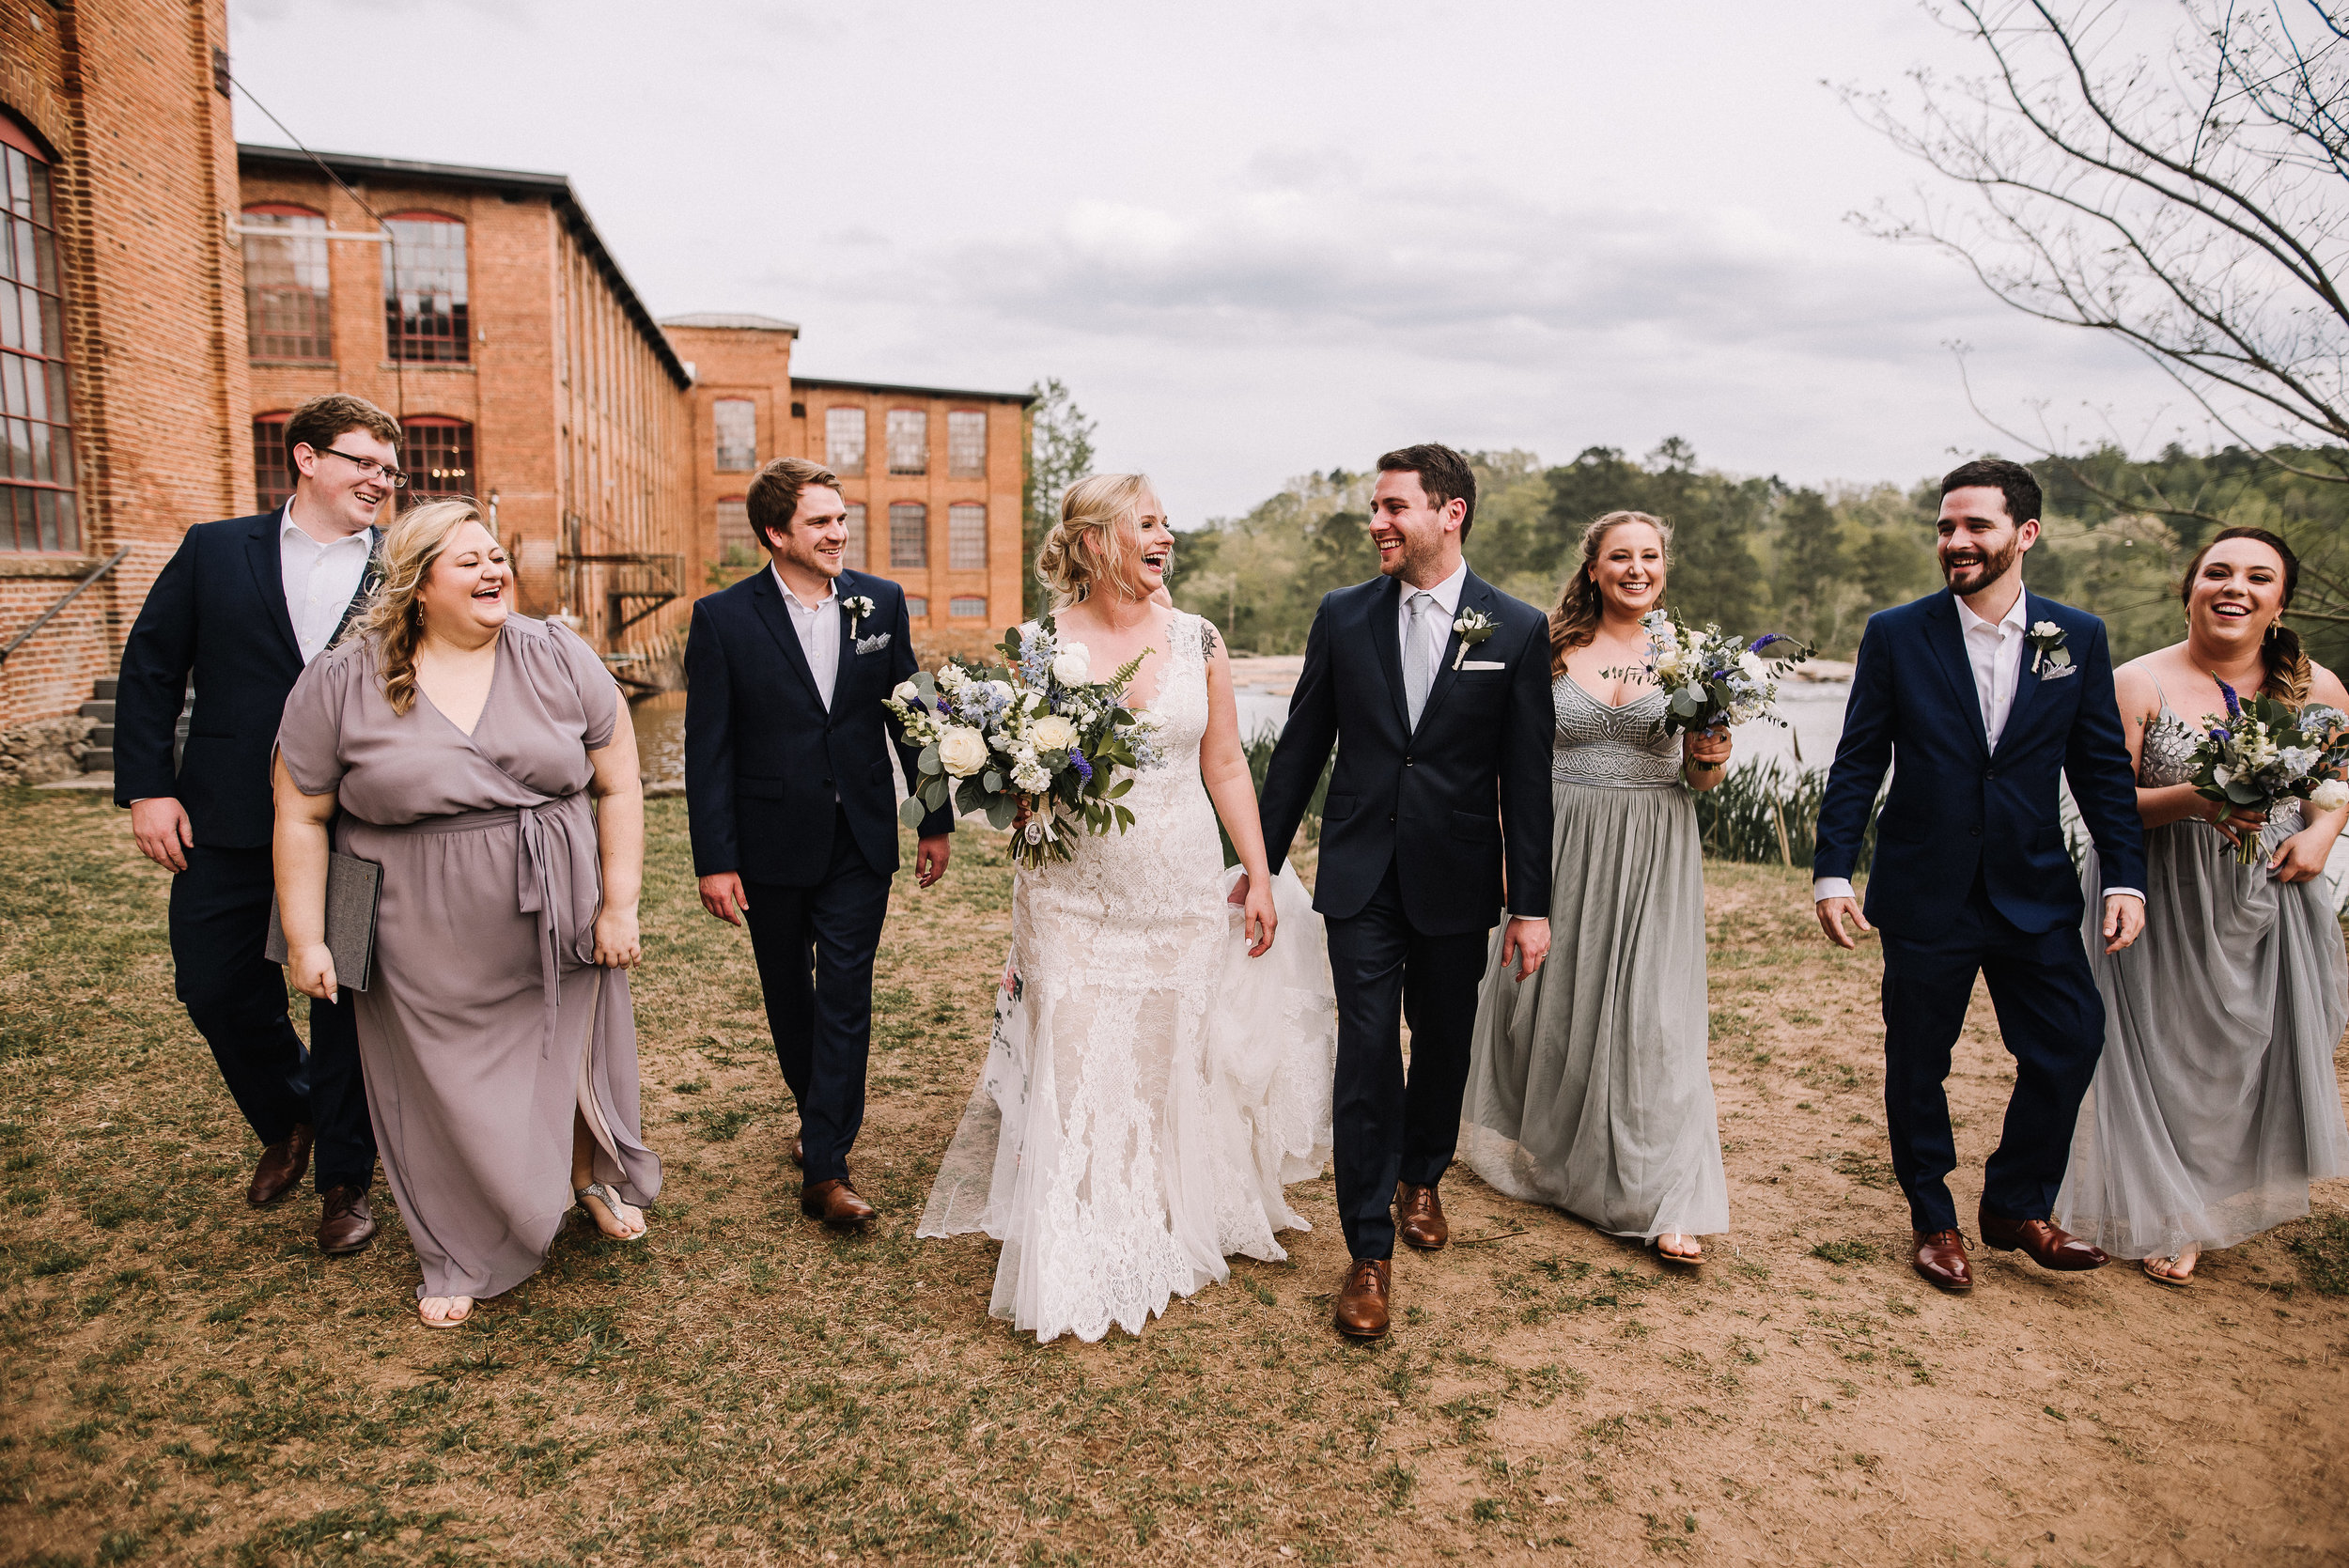 Morgan Wedding_Mill at Yellow River_Ashley Benham Photography-743.jpg